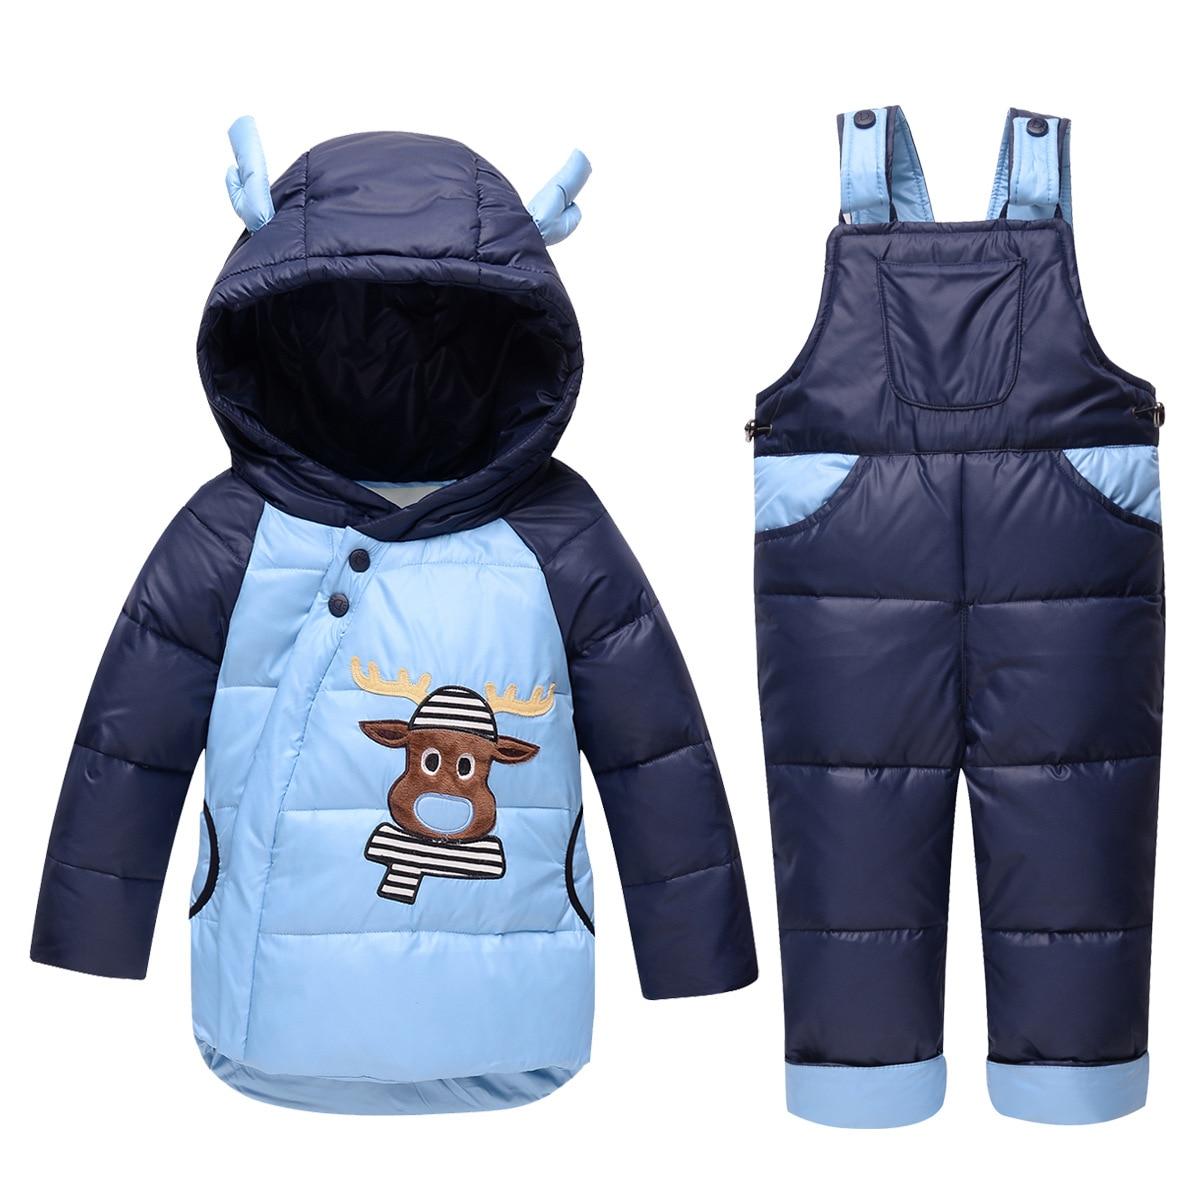 winter warm down children clothing girls winter kids clothing boys parka jackets dress for girls snow fashion bburago сборная модель автомобиля renault laguna coupe